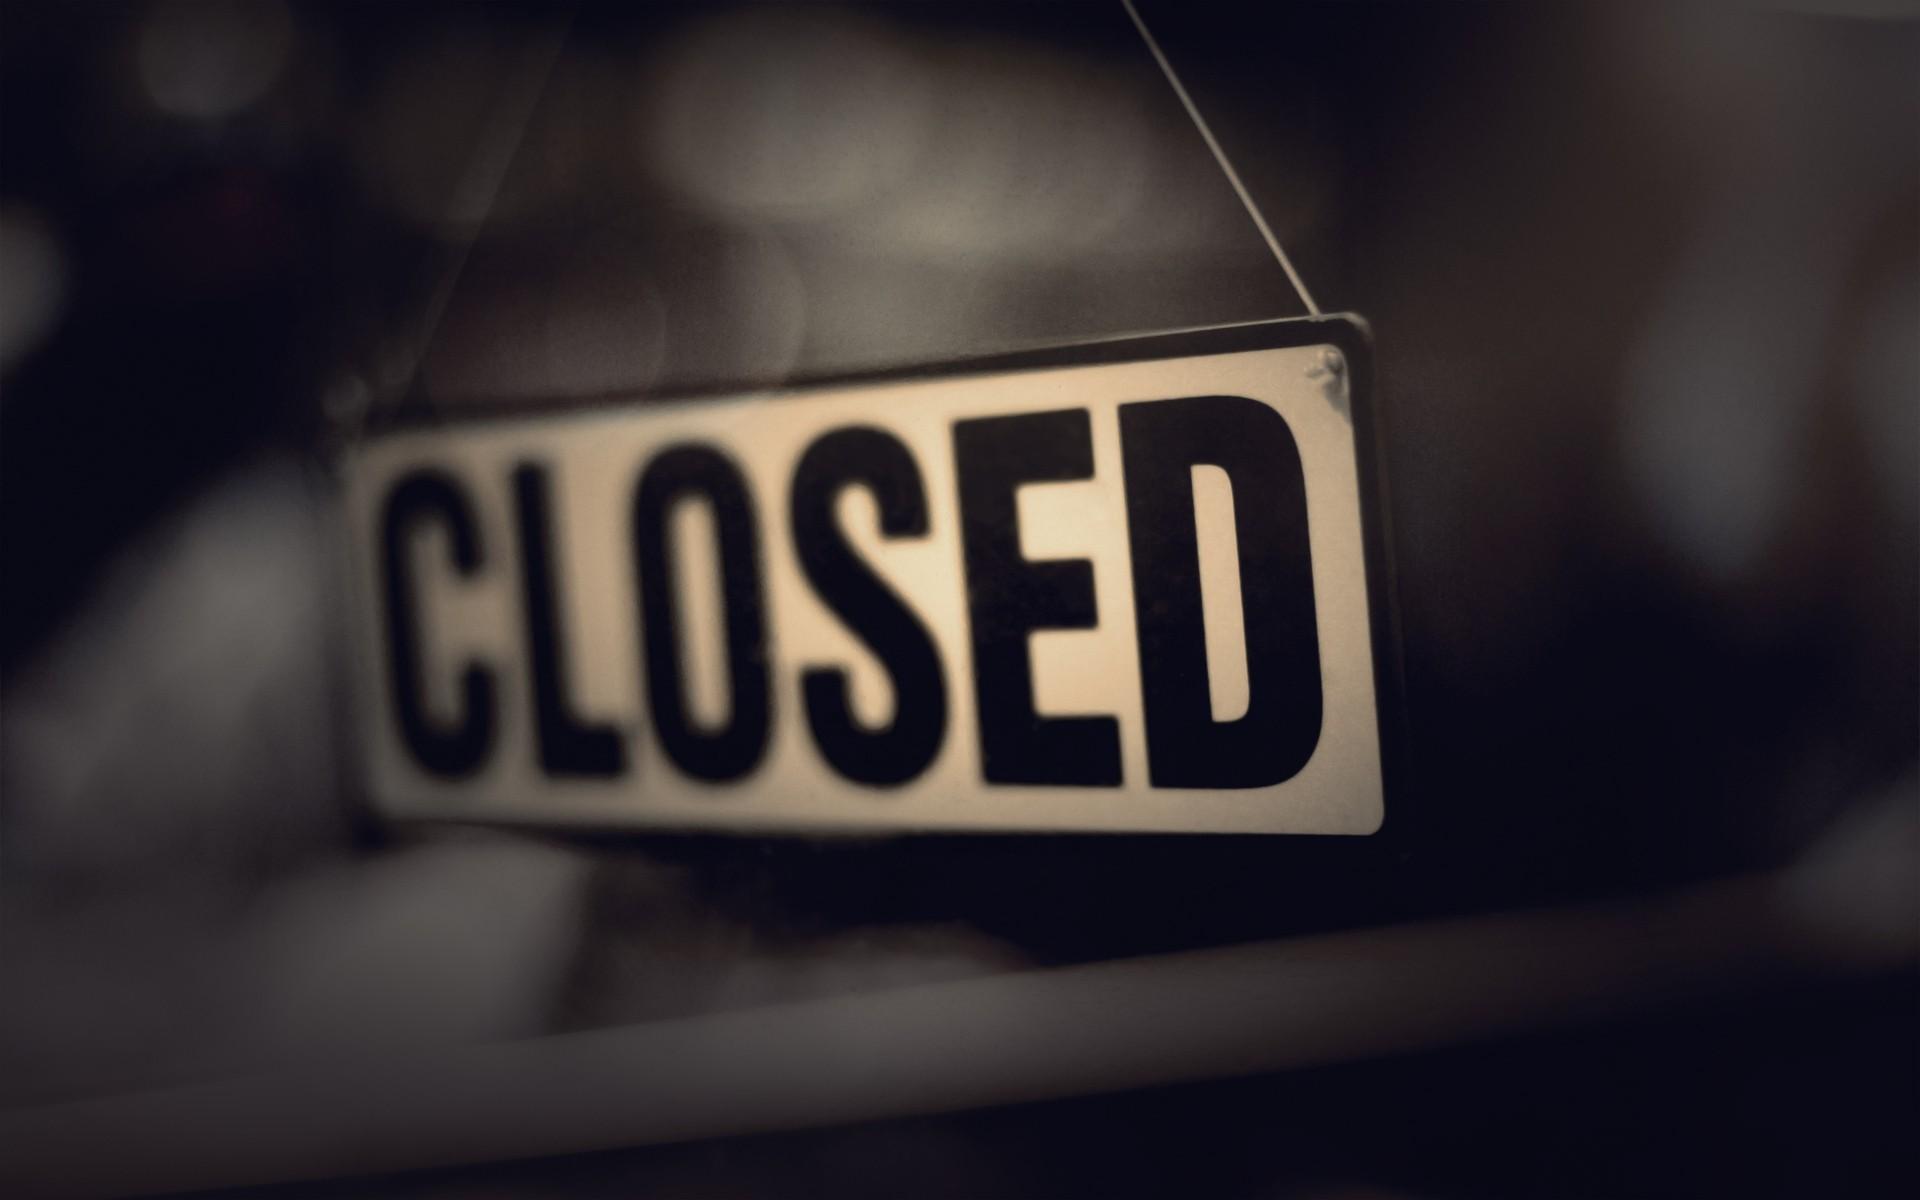 Closed photo